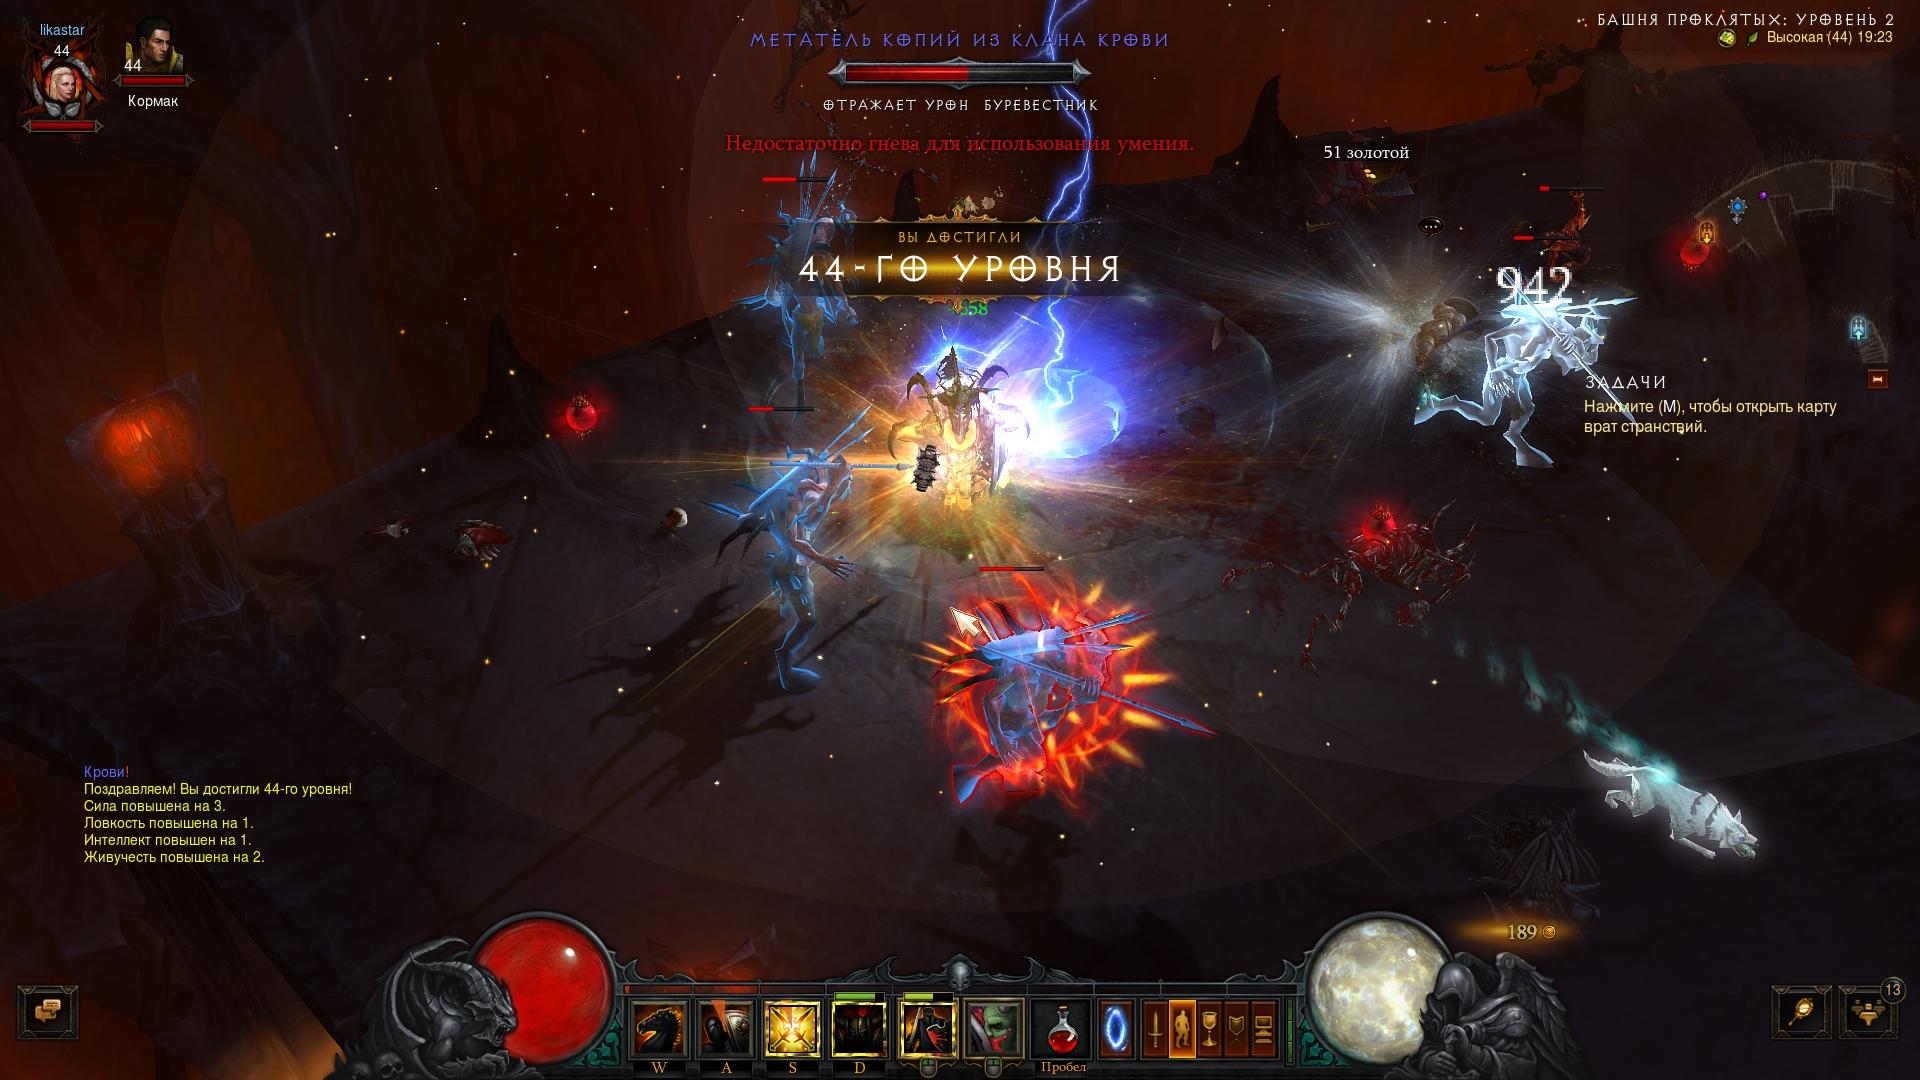 Screenshot001.jpg - Diablo 3